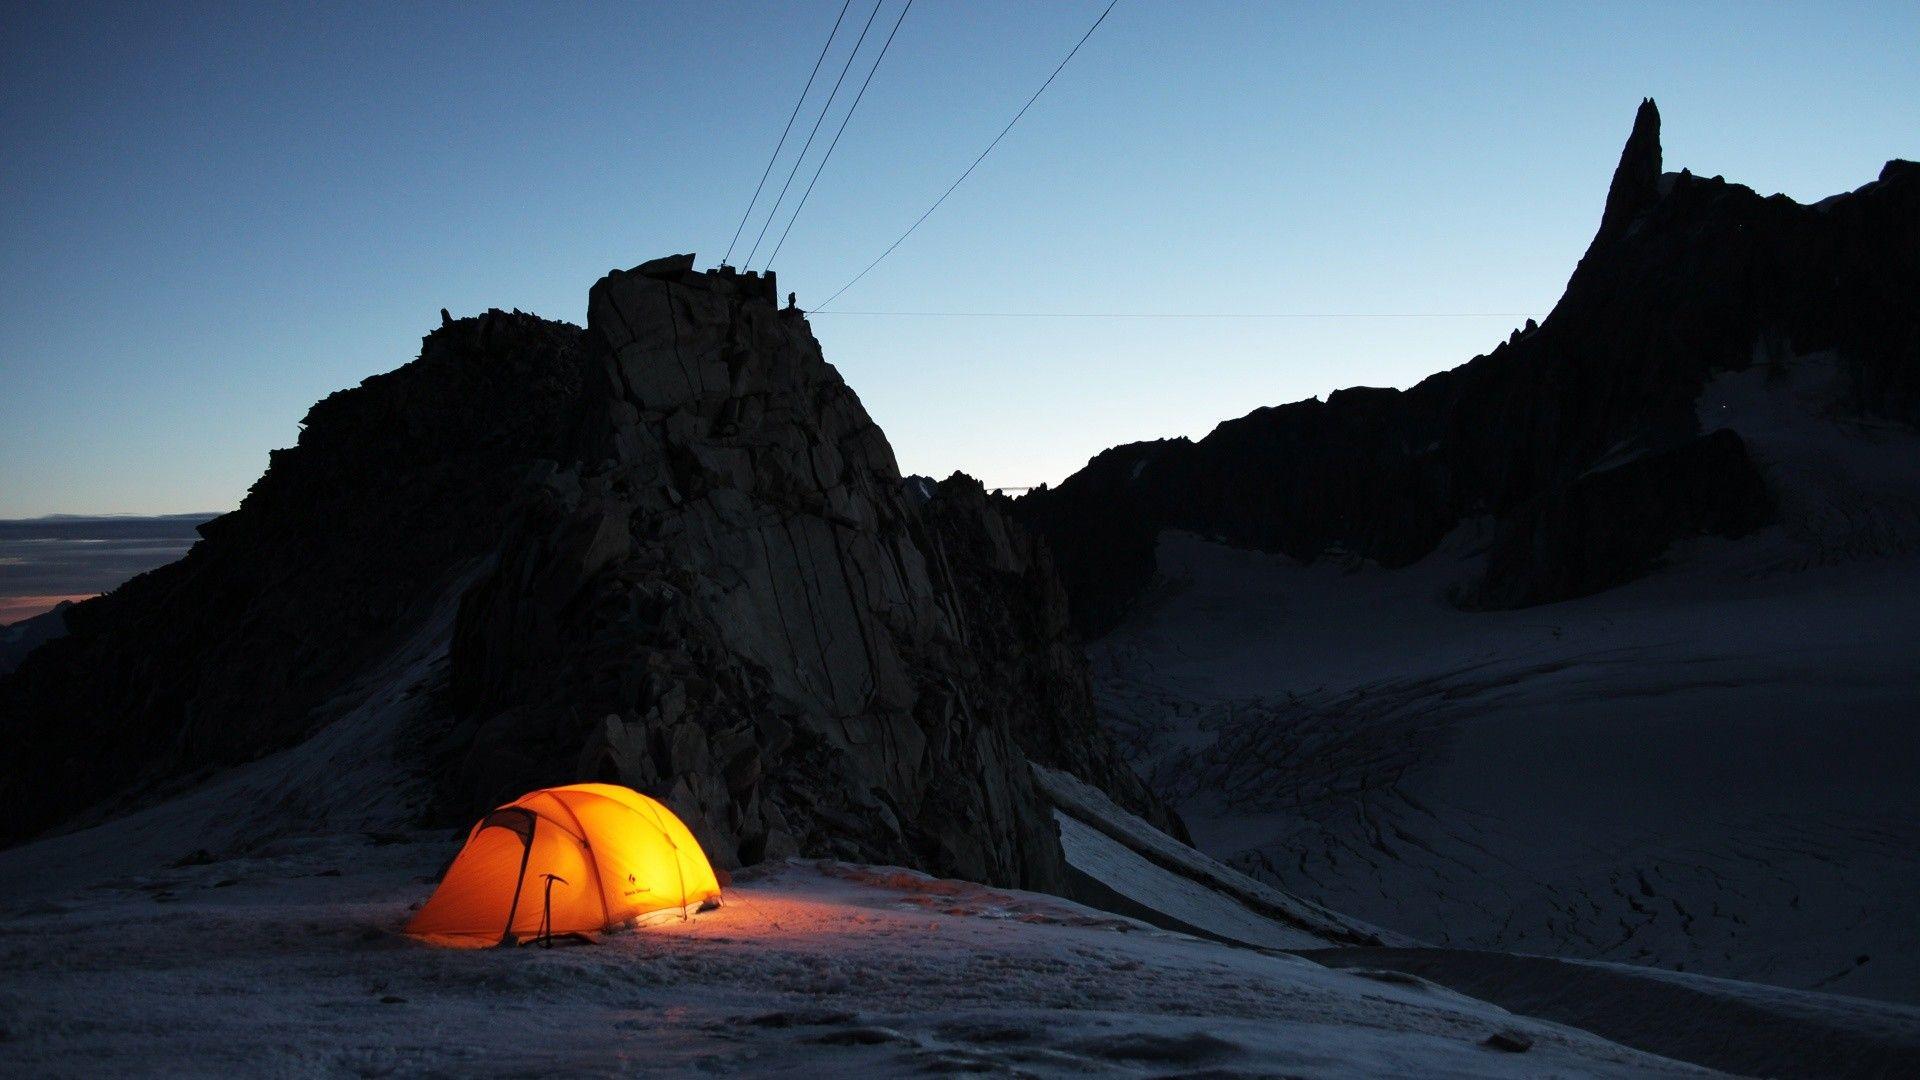 Journey Hiking Wallpaper 2625703 Camping Wallpaper Pc Desktop Wallpaper Adventure Camping